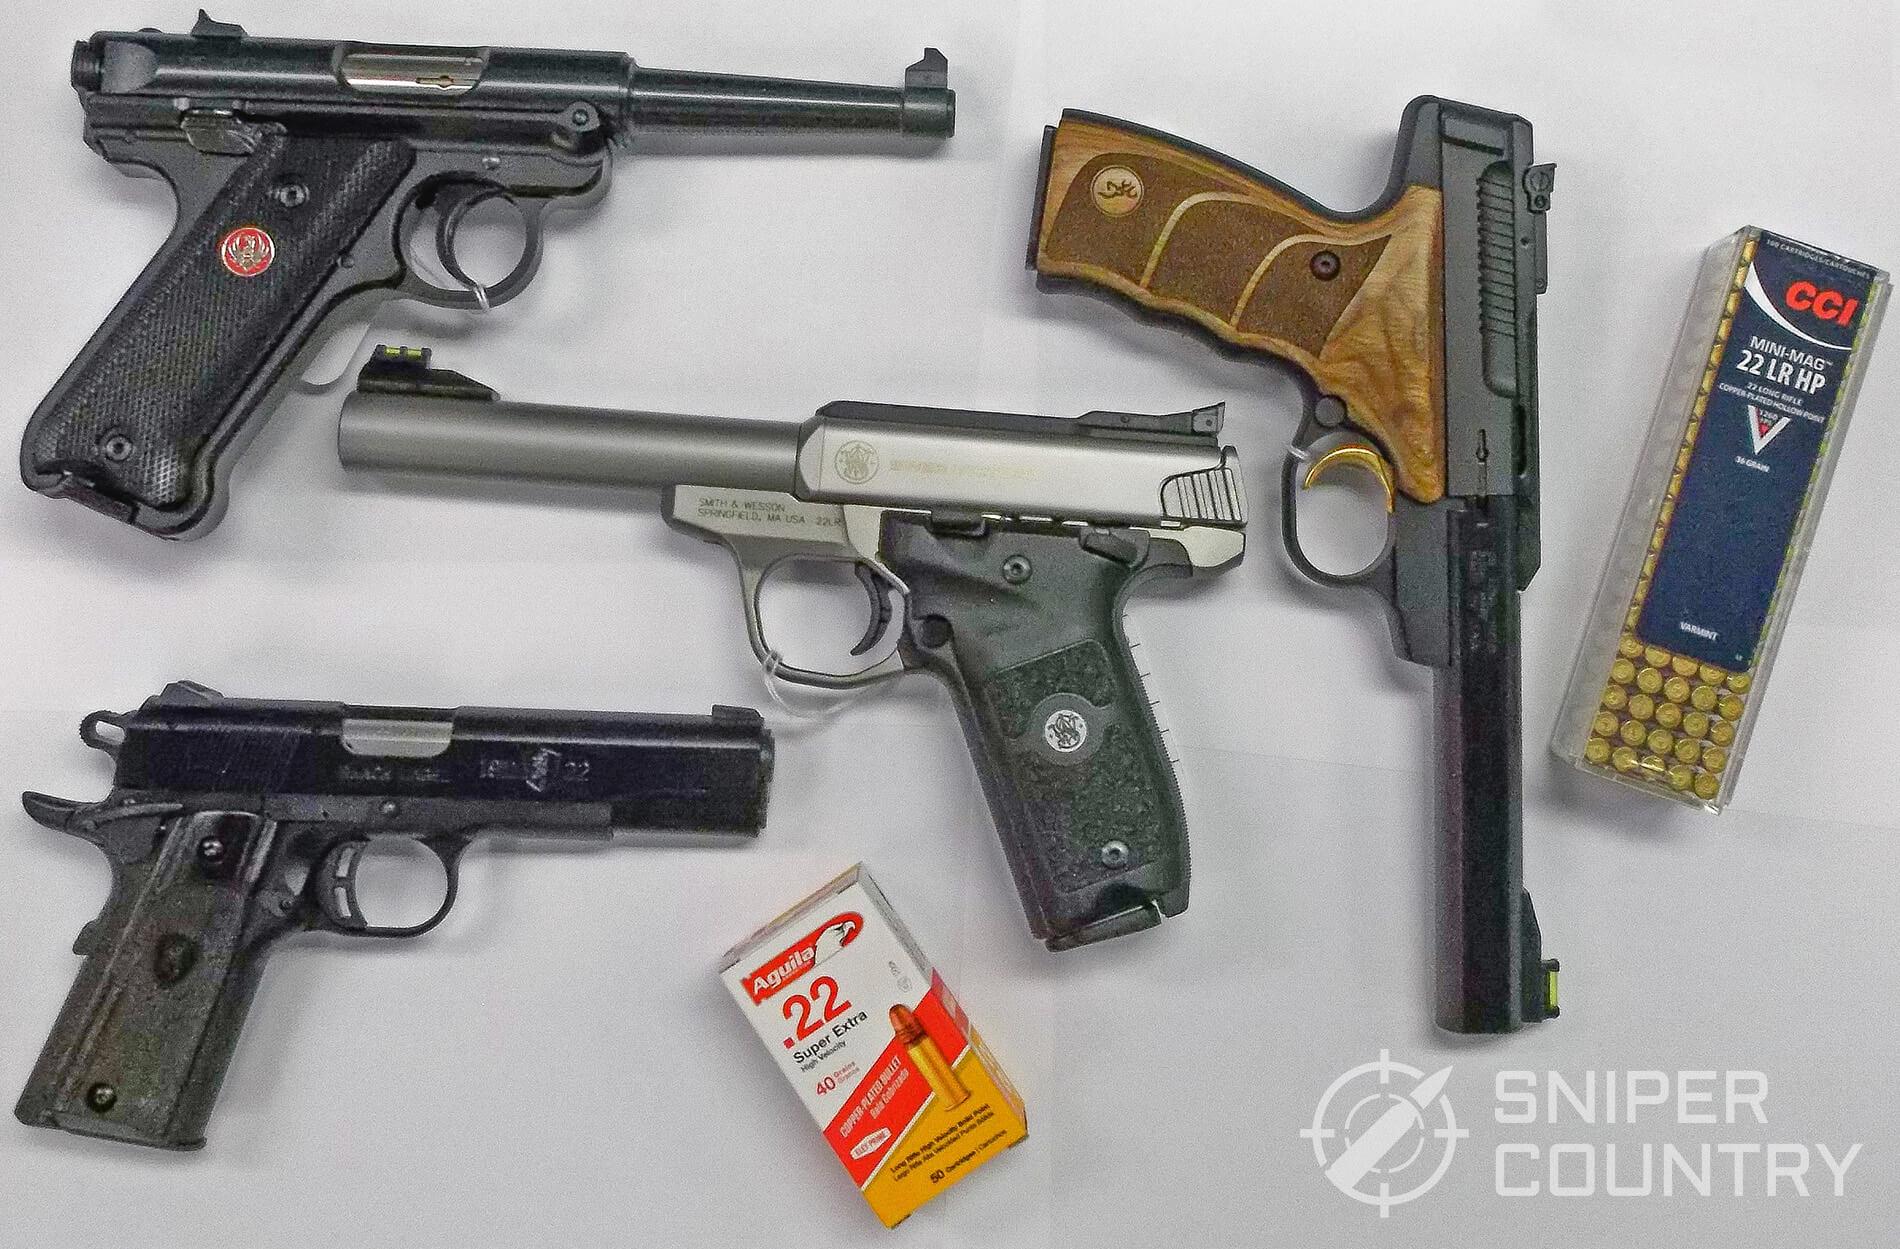 22 LR Pistols and Ammo